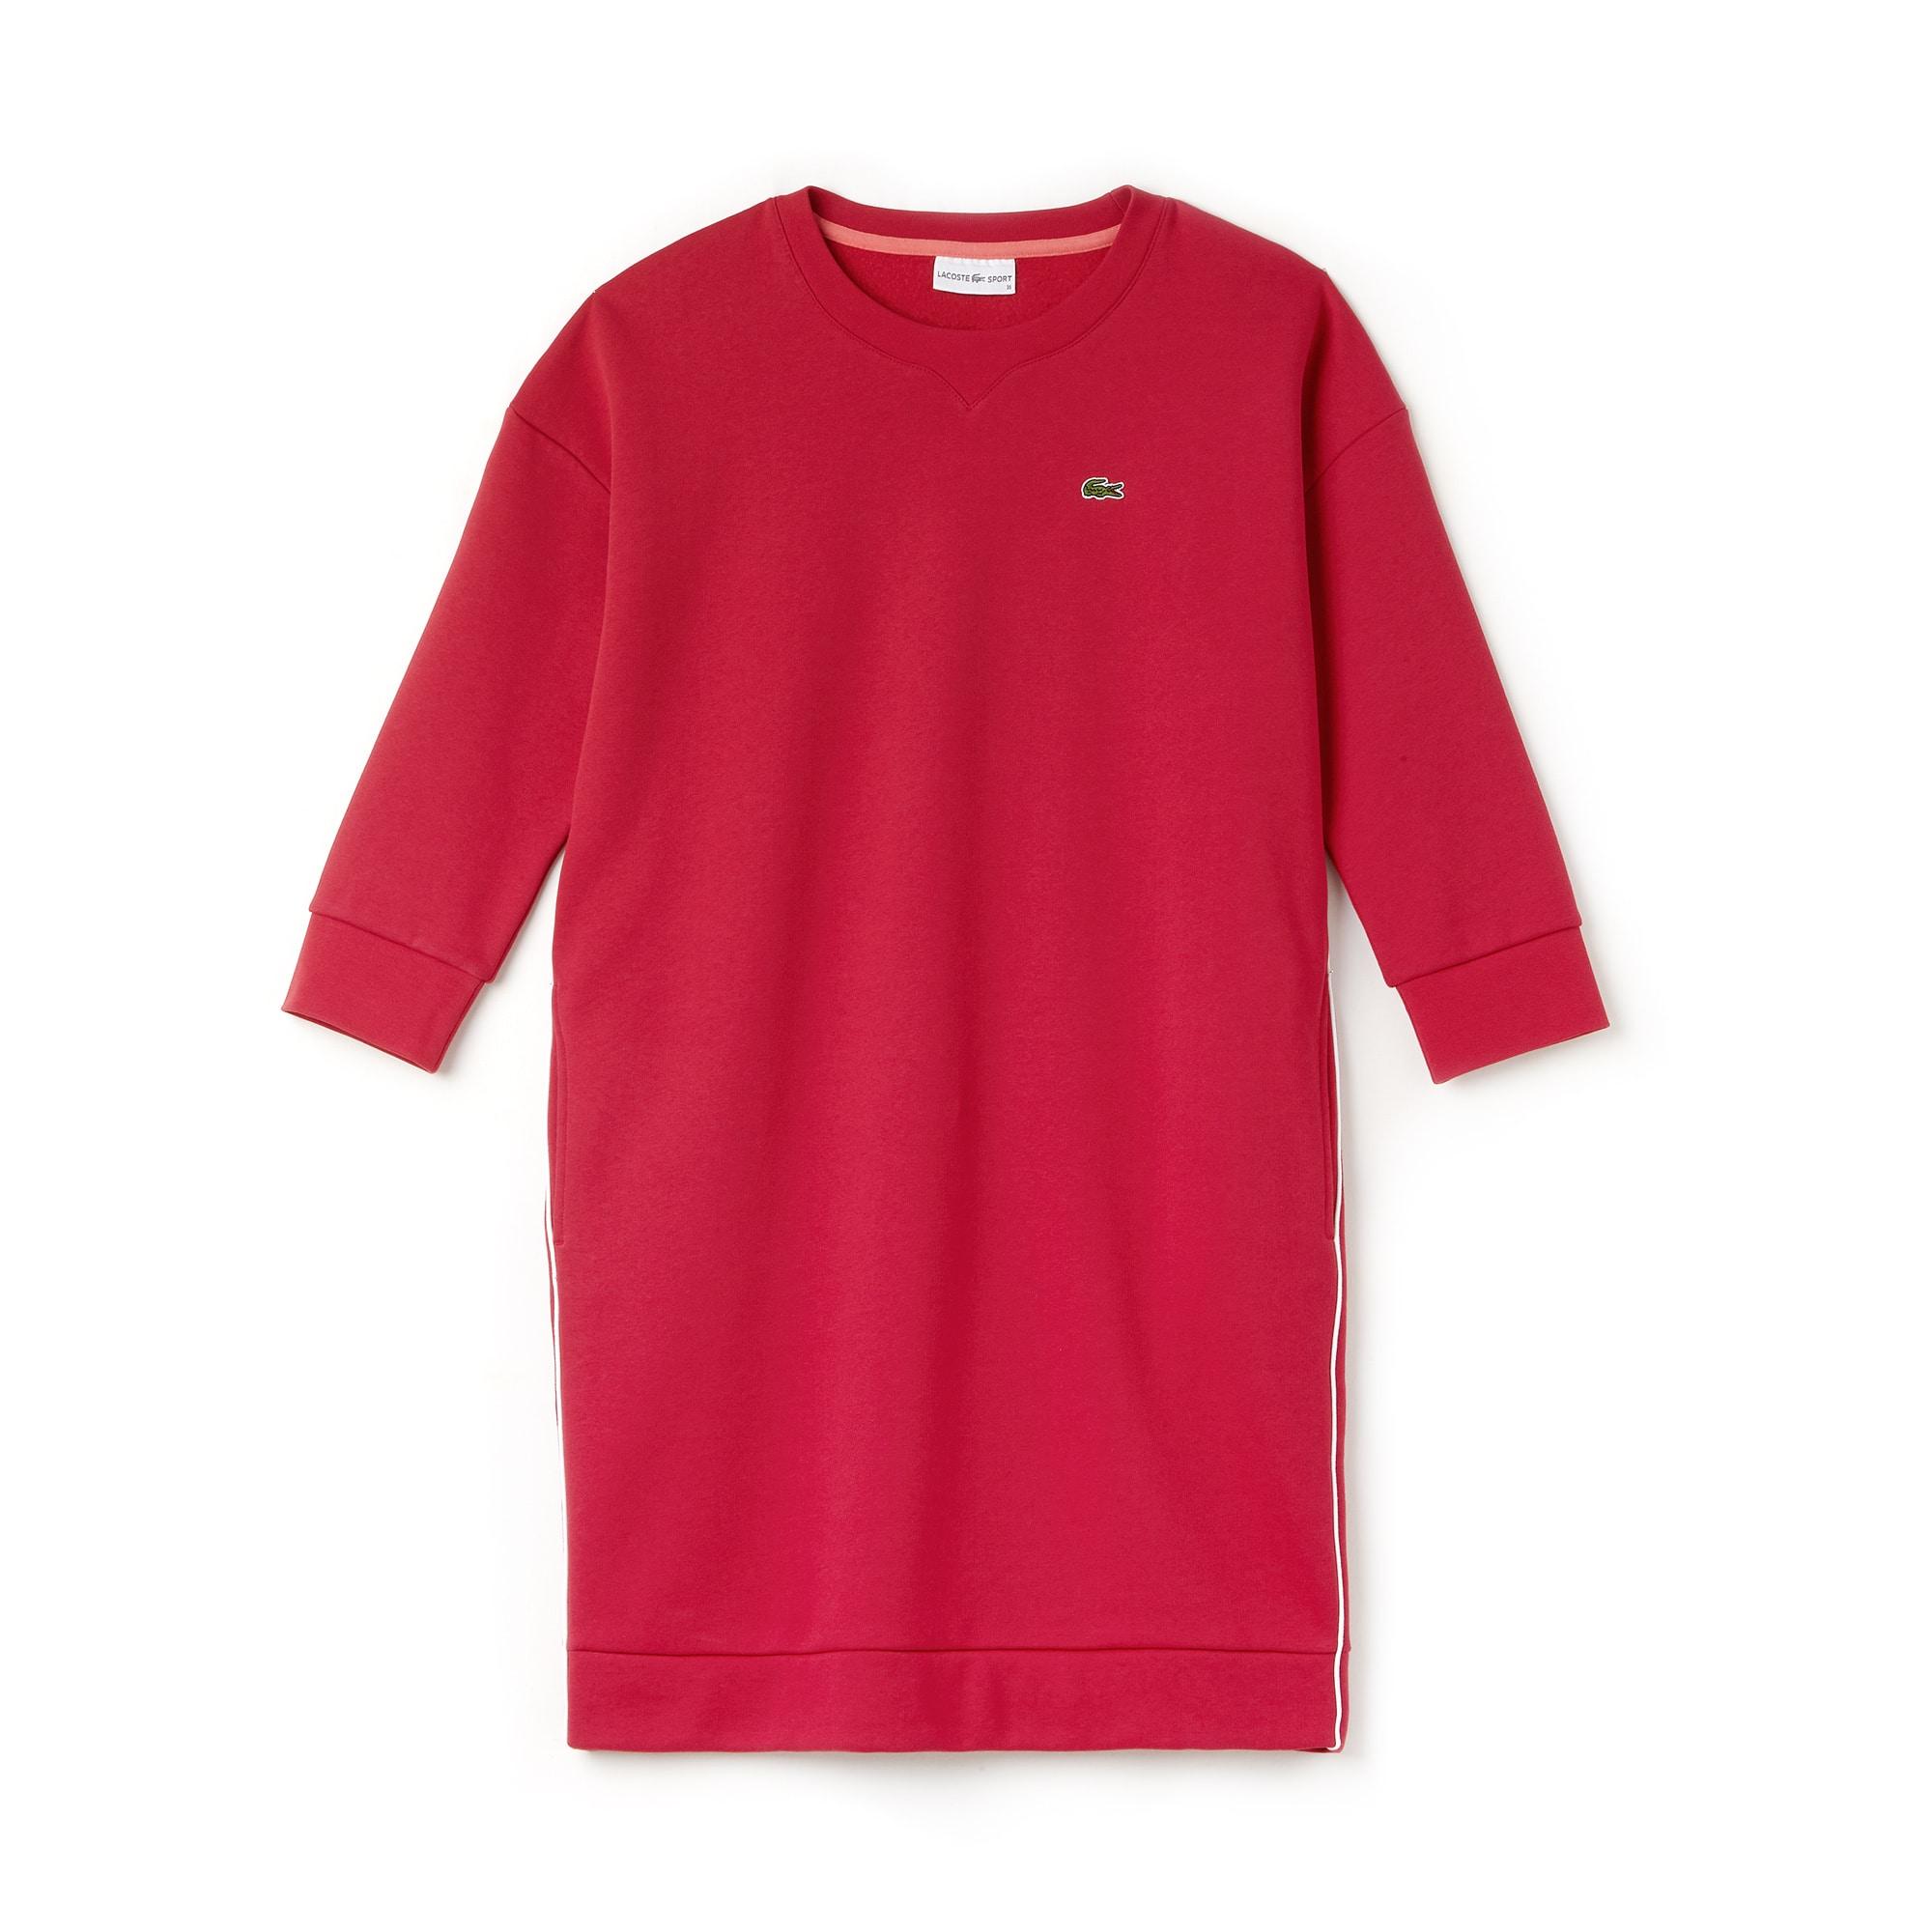 Lacoste SPORT系列女士滚边拉绒网球运动衫式连身裙